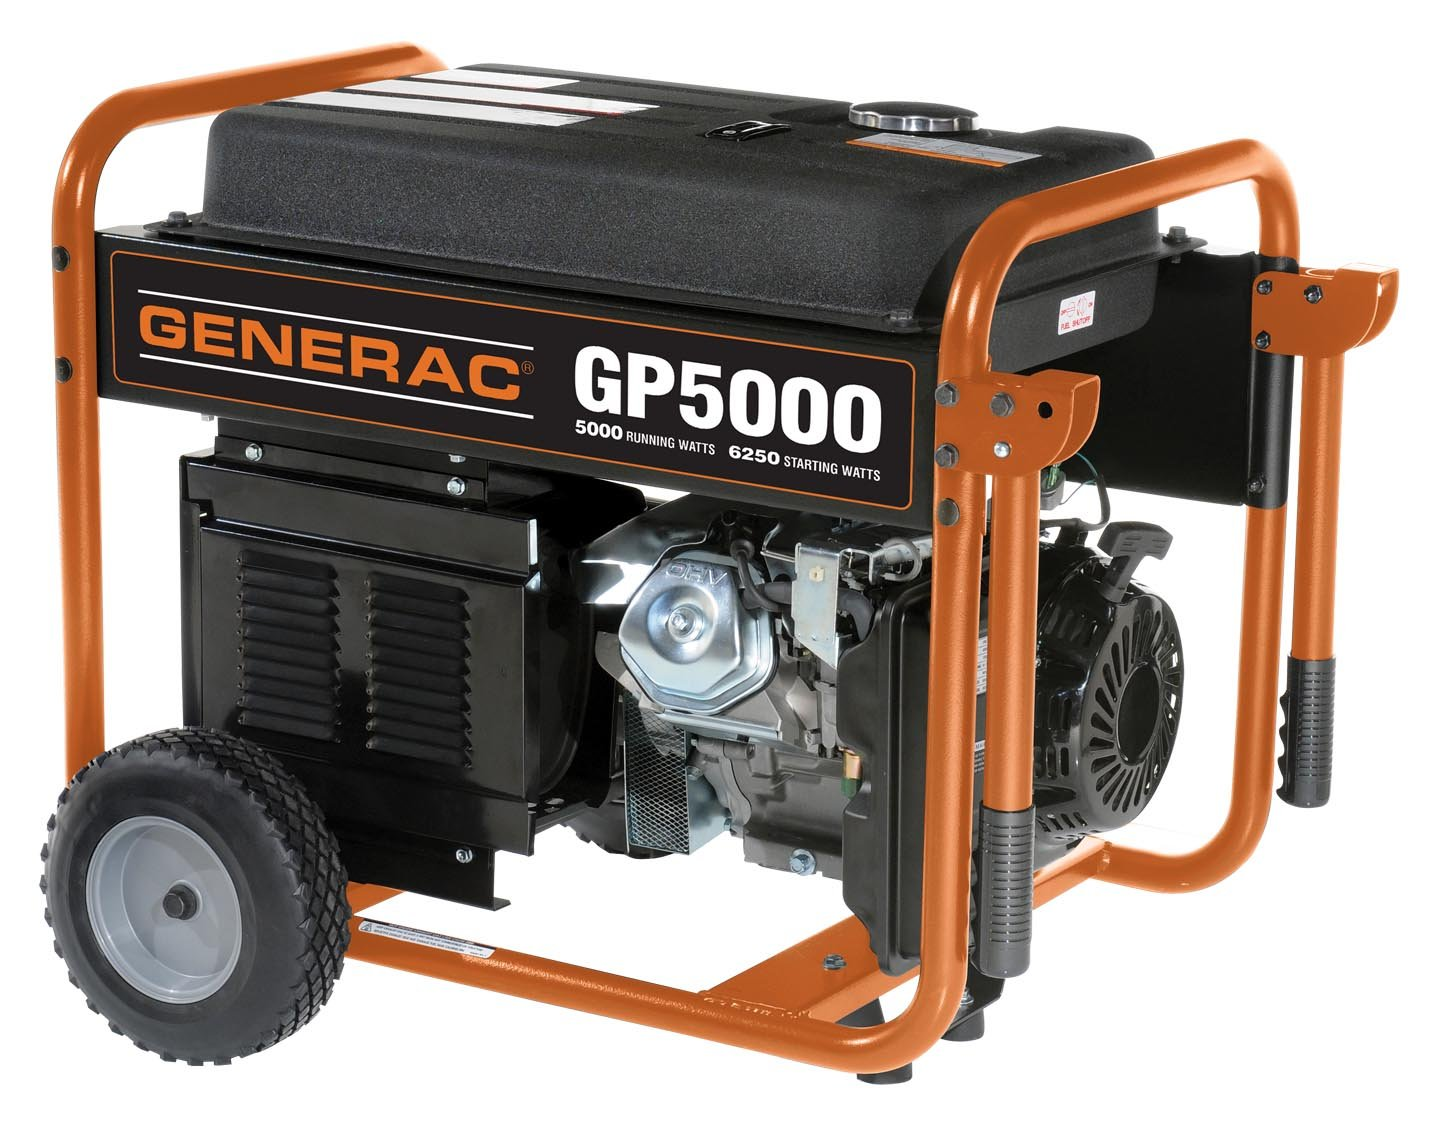 Amazon.com : Generac 5938 GP5000 6, 250 Watt 389cc OHV Portable Gas Powered  Generator (Discontinued by Manufacturer) : Garden & Outdoor